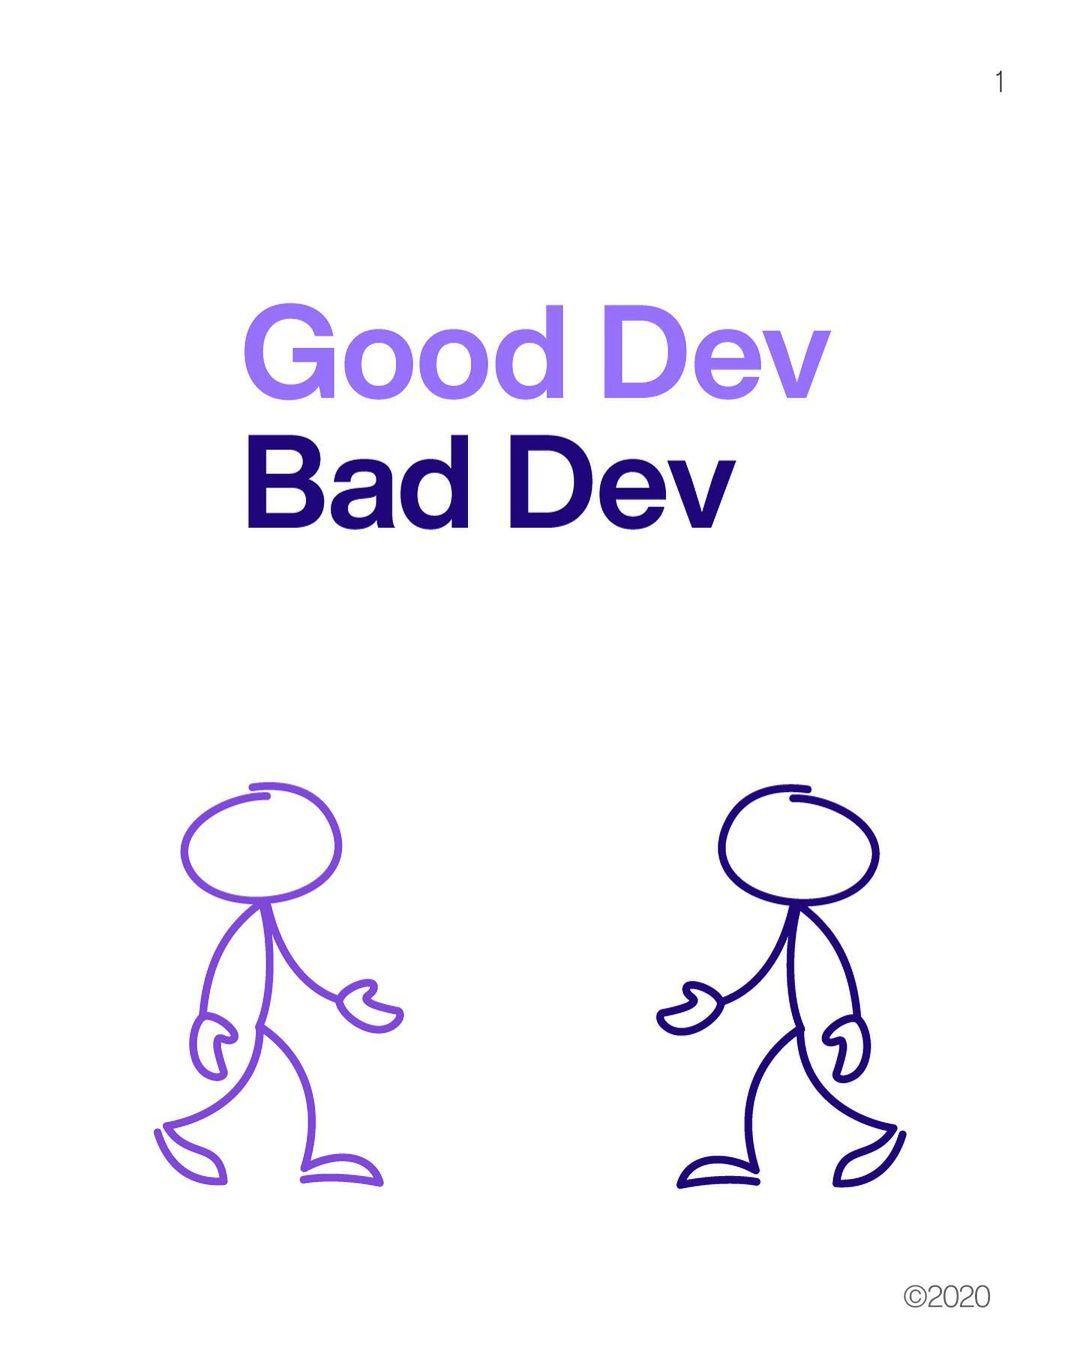 Good dev bad dev